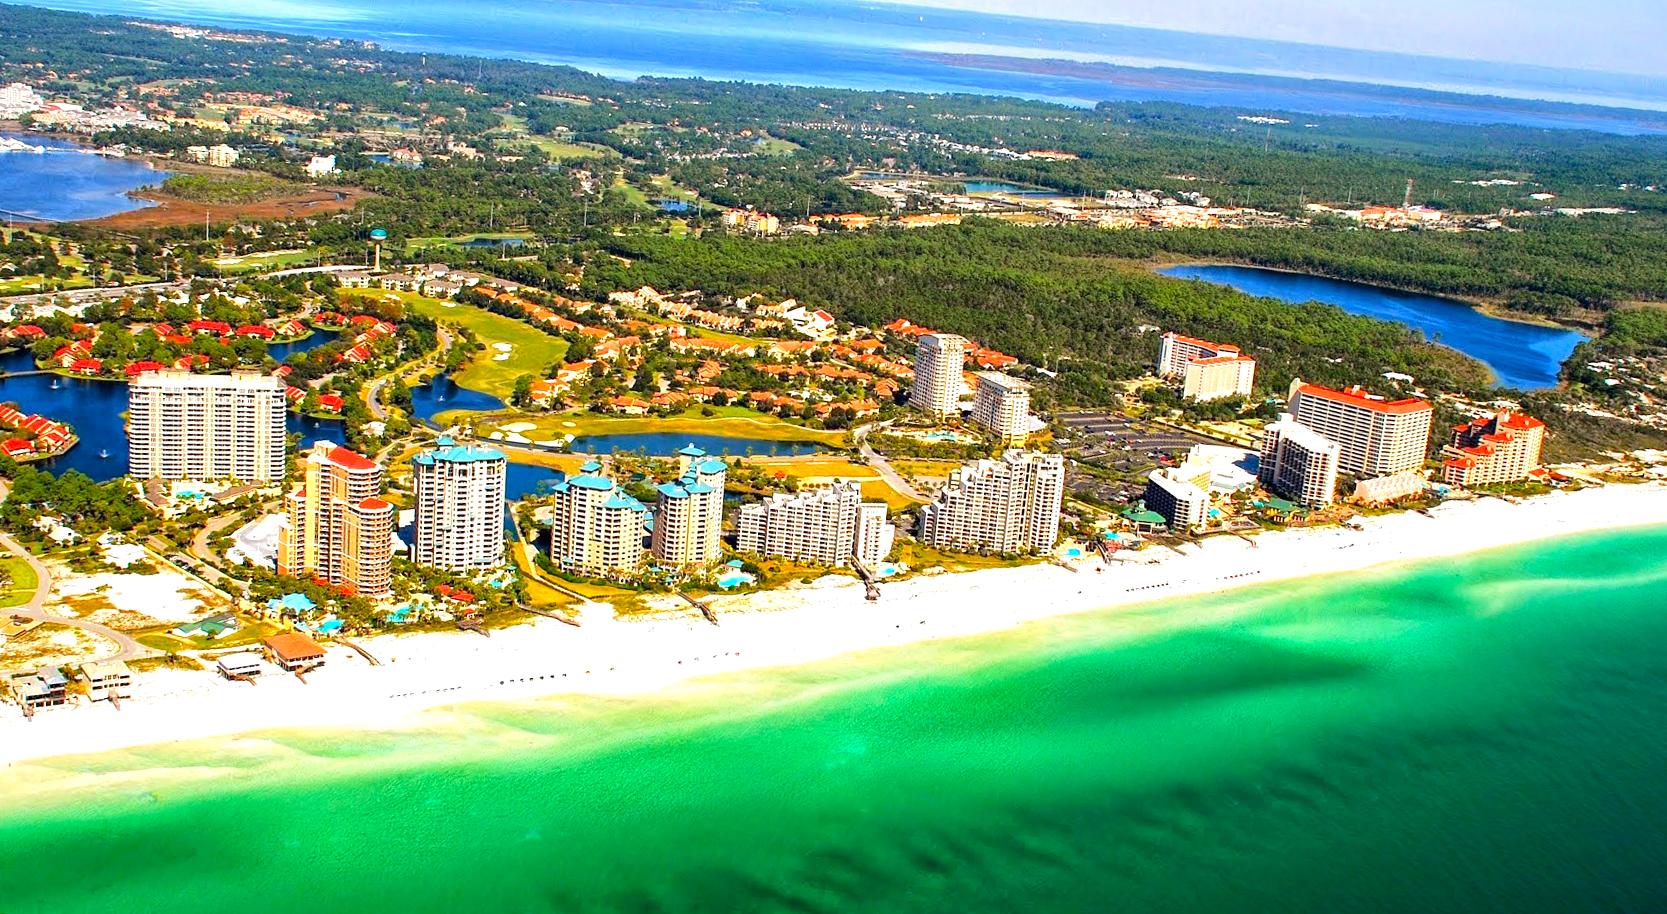 Miramar-Sandestin Resort, Florida